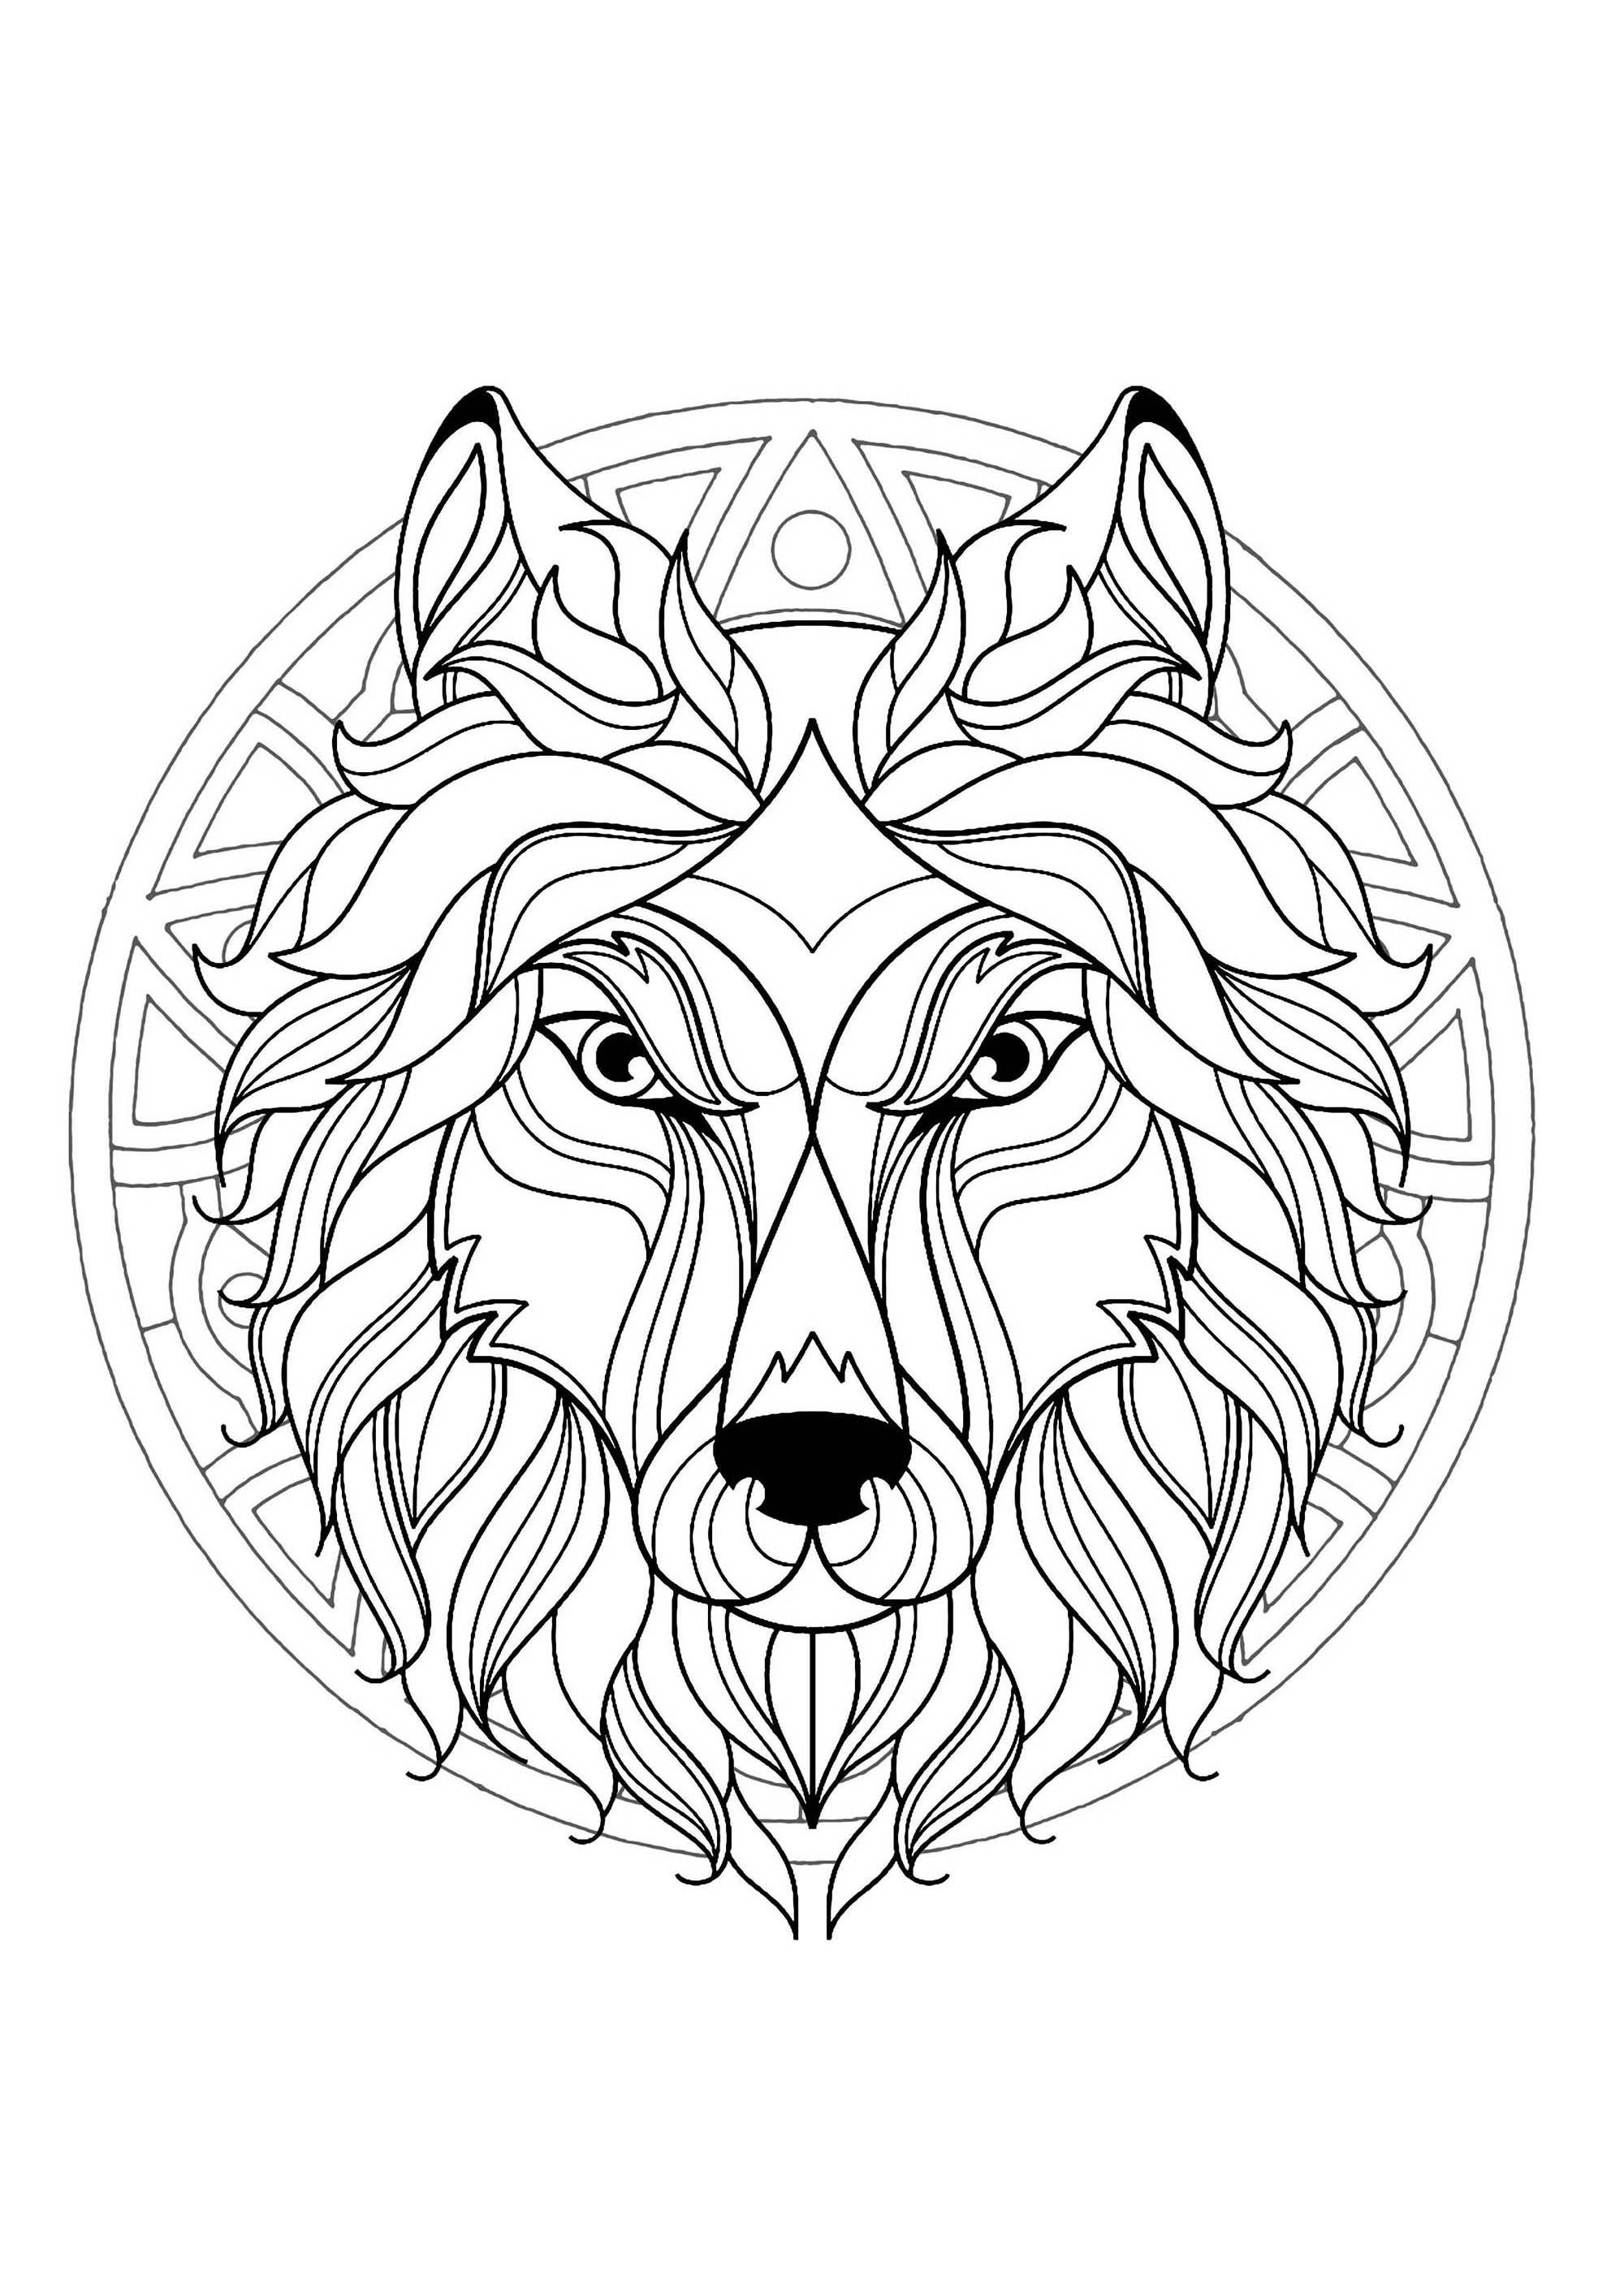 Mandalas 48411 - Mandalas - Malbuch Fur Erwachsene